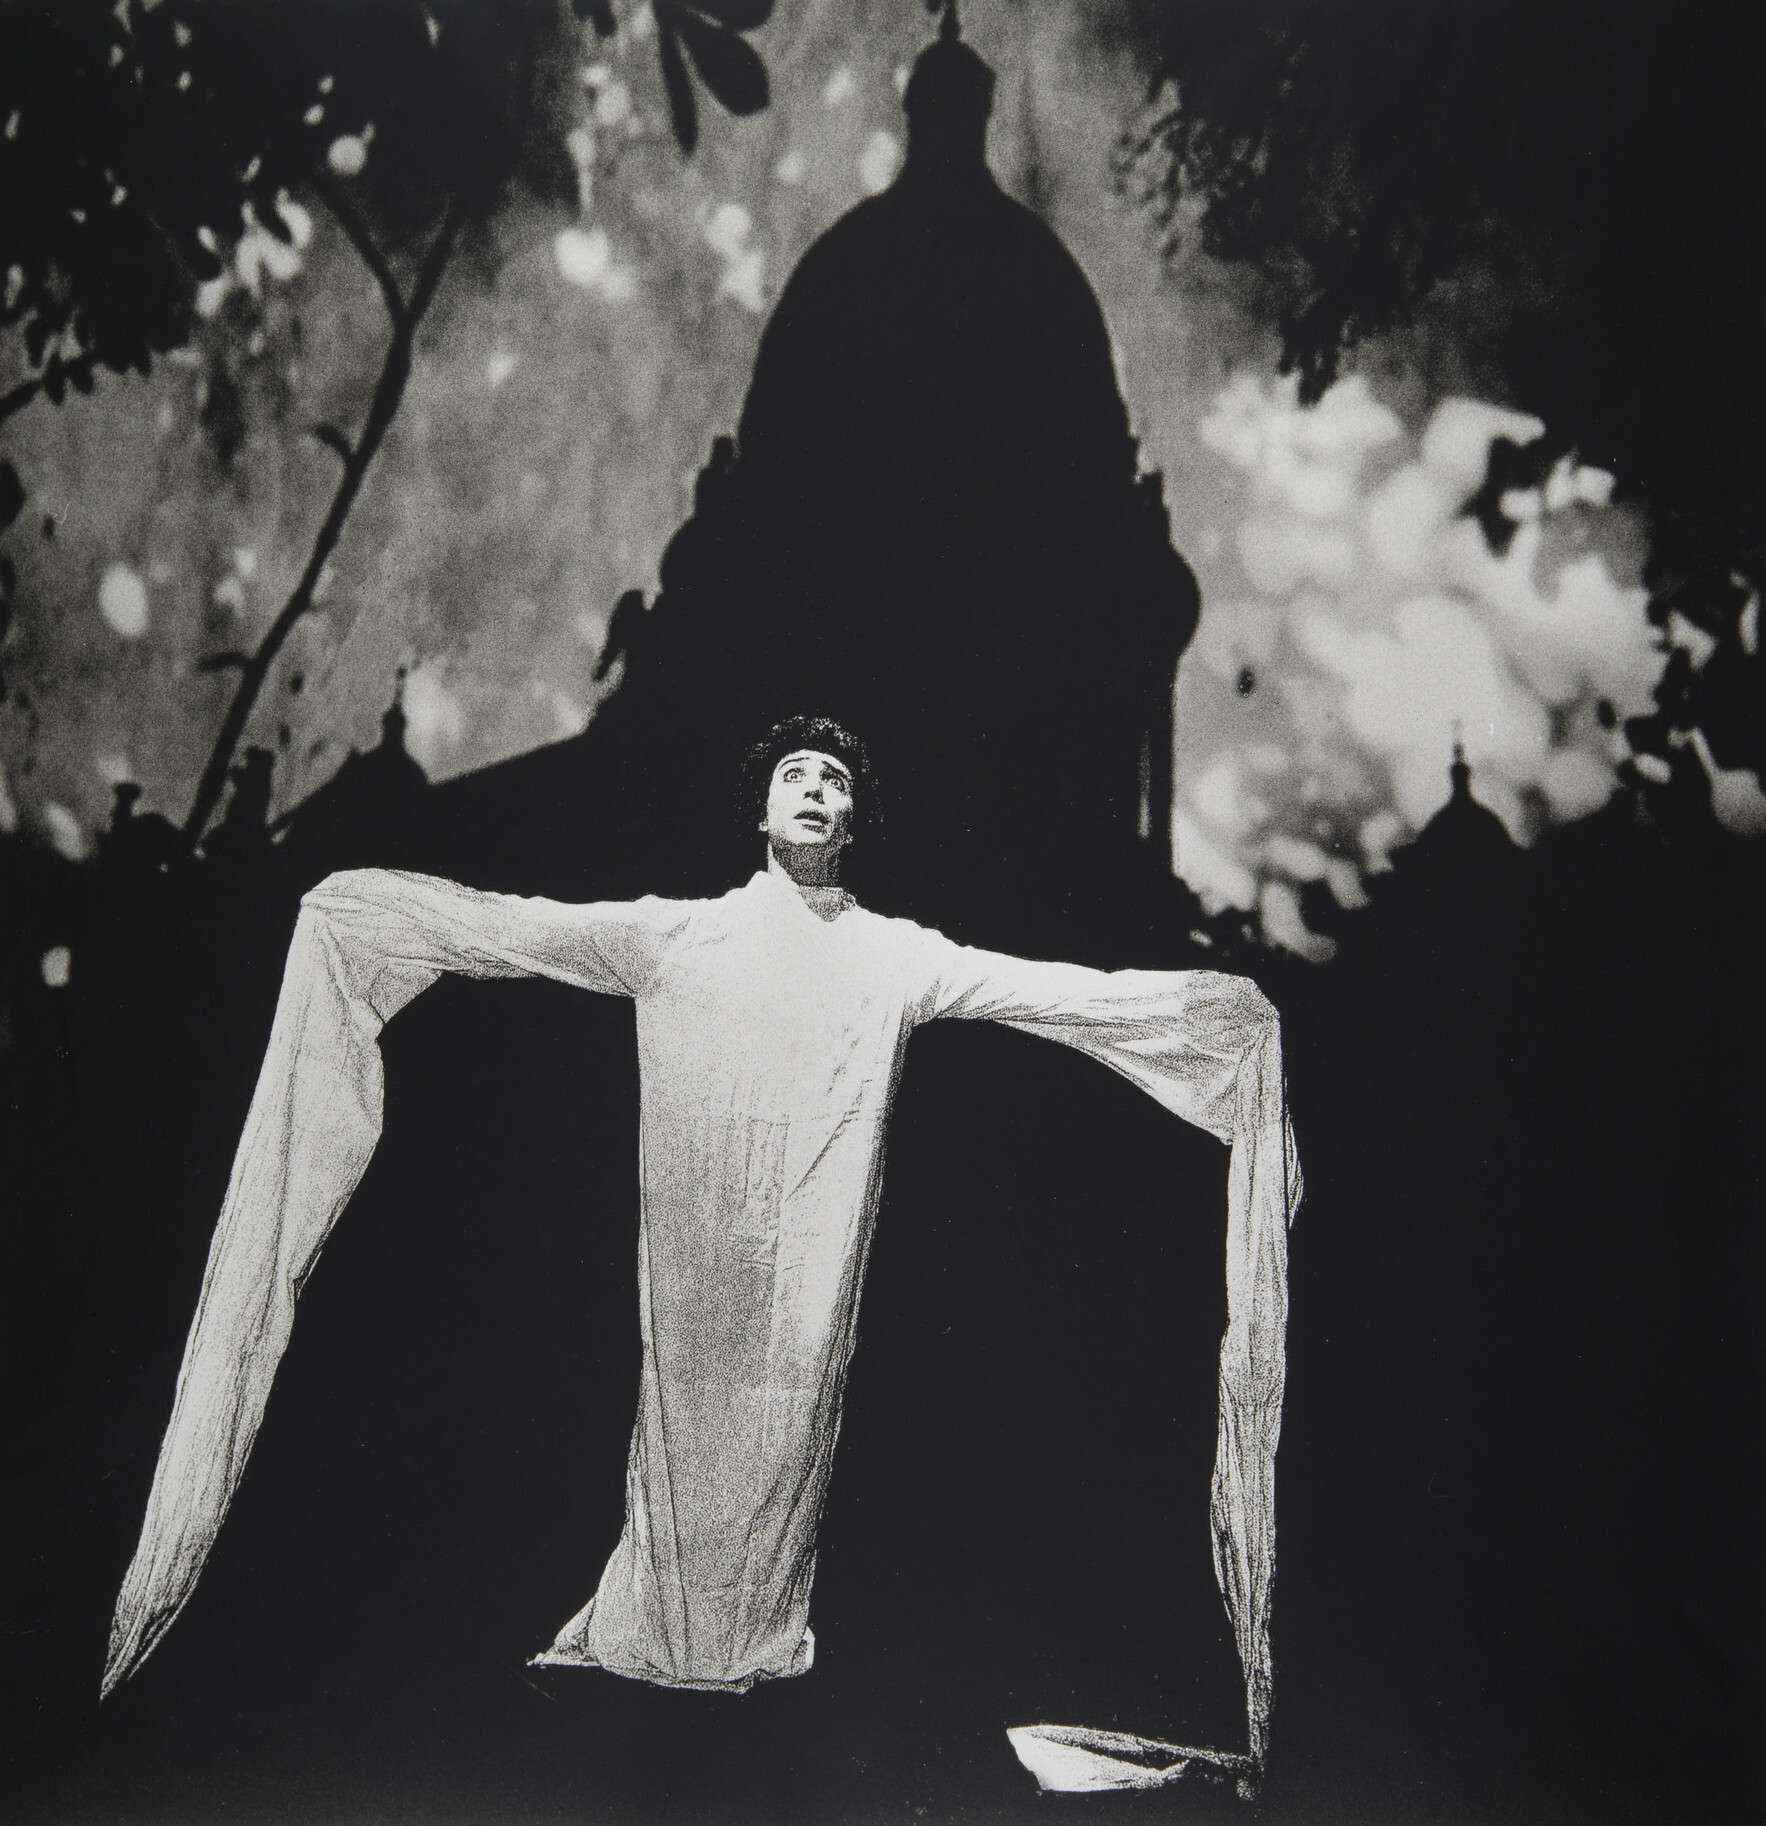 Дегтярев В.К. (1937)